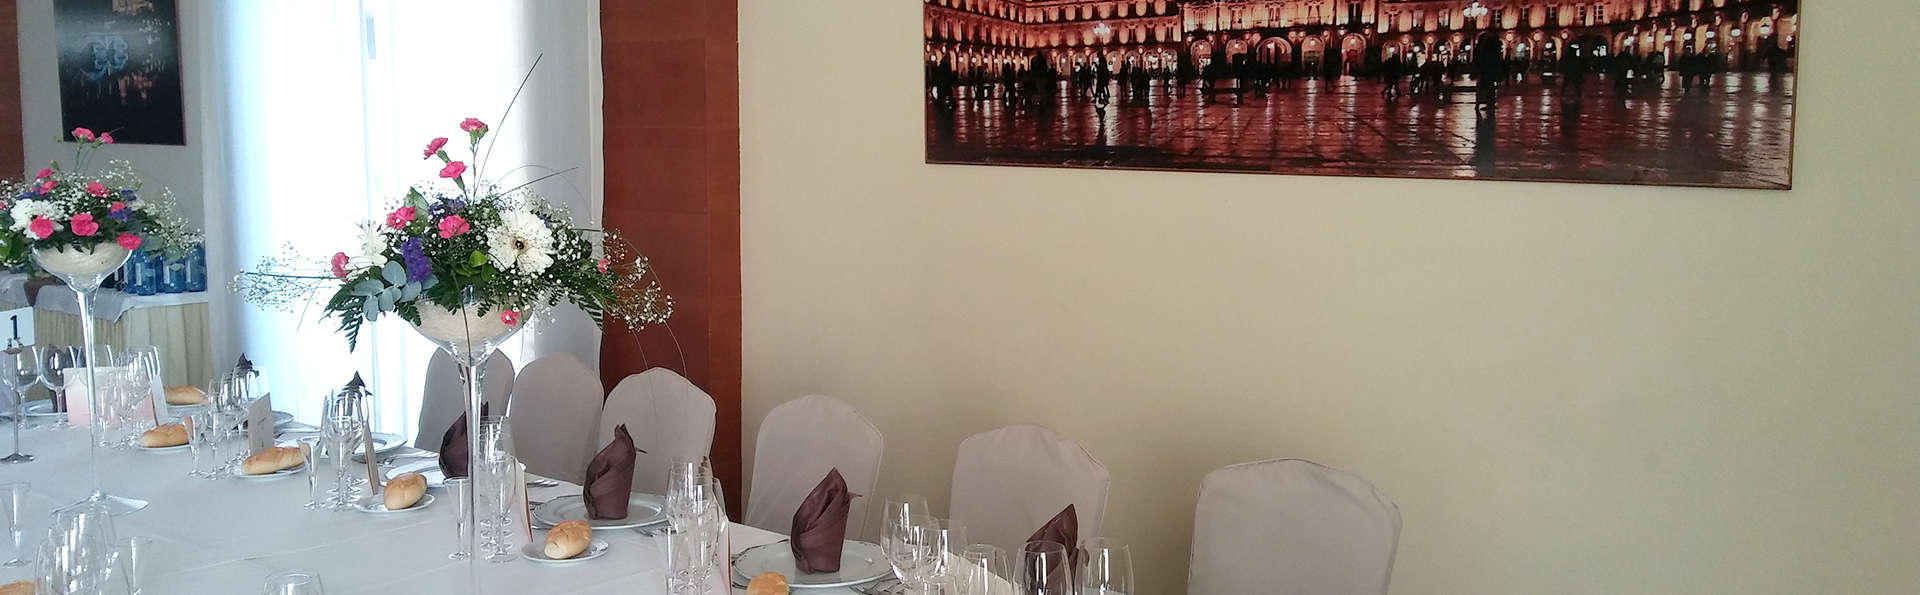 Hotel Ibb Recoletos Coco Salamanca - EDIT_NEW_Restaurant.jpg